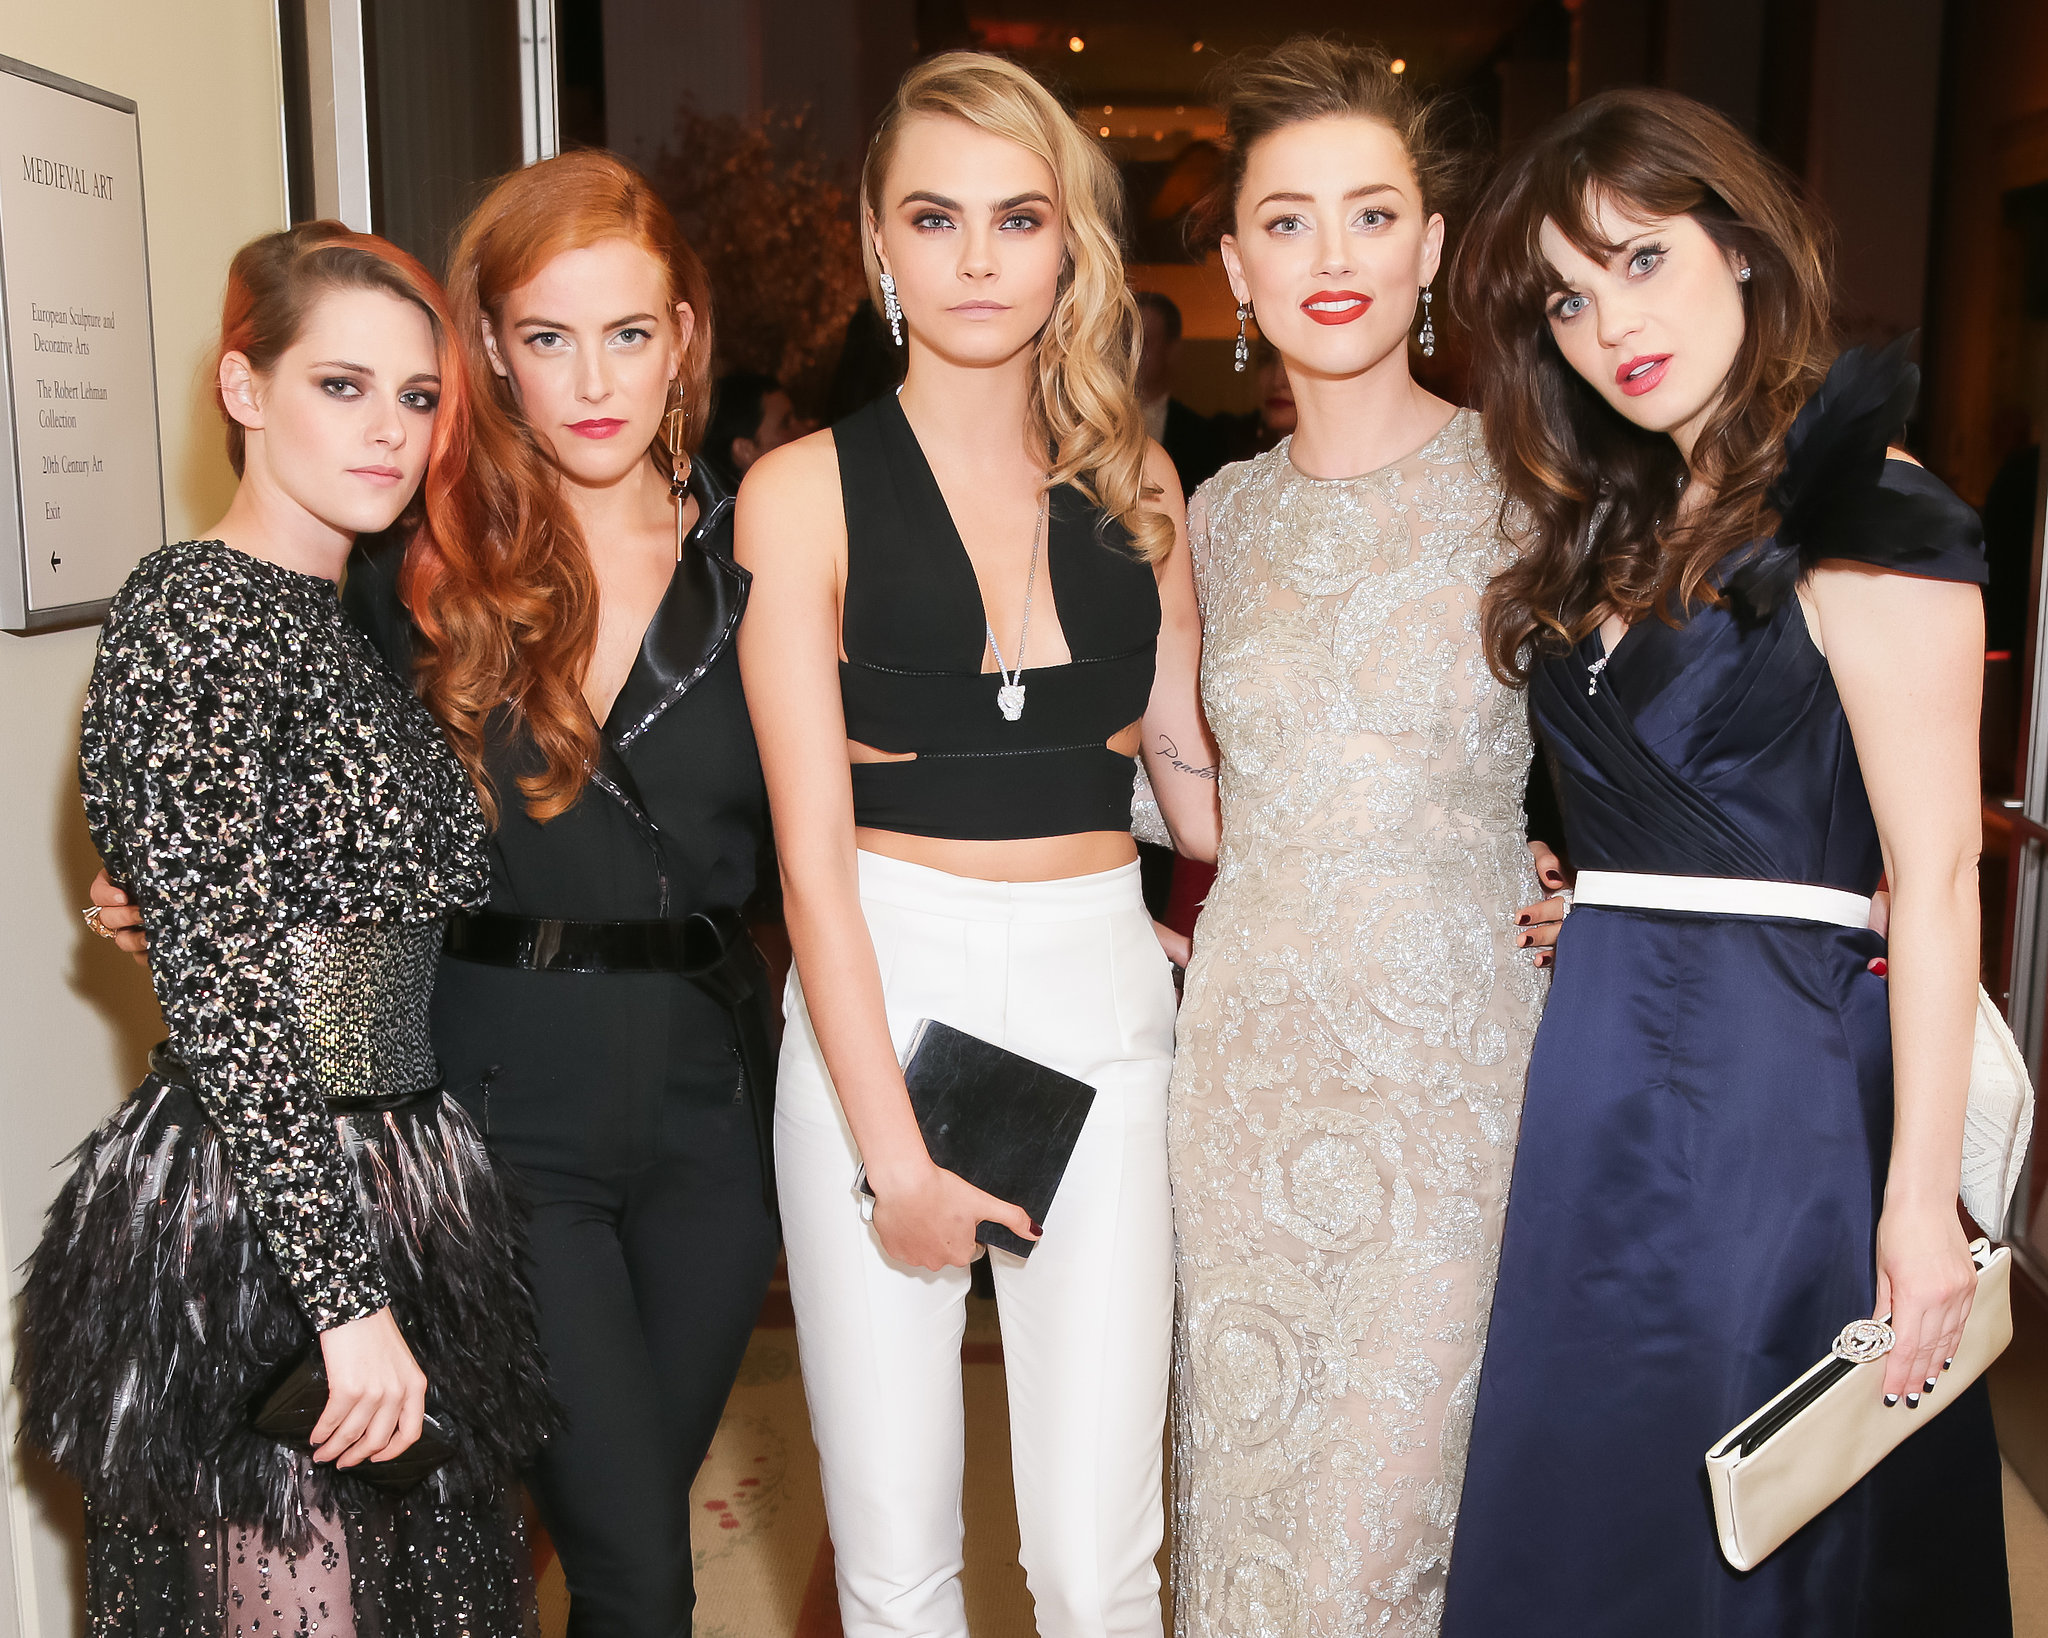 Kristen Stewart, Riley Keough, Cara Delevingne, Amber Heard, and Zooey Deschanel met up for a snap.